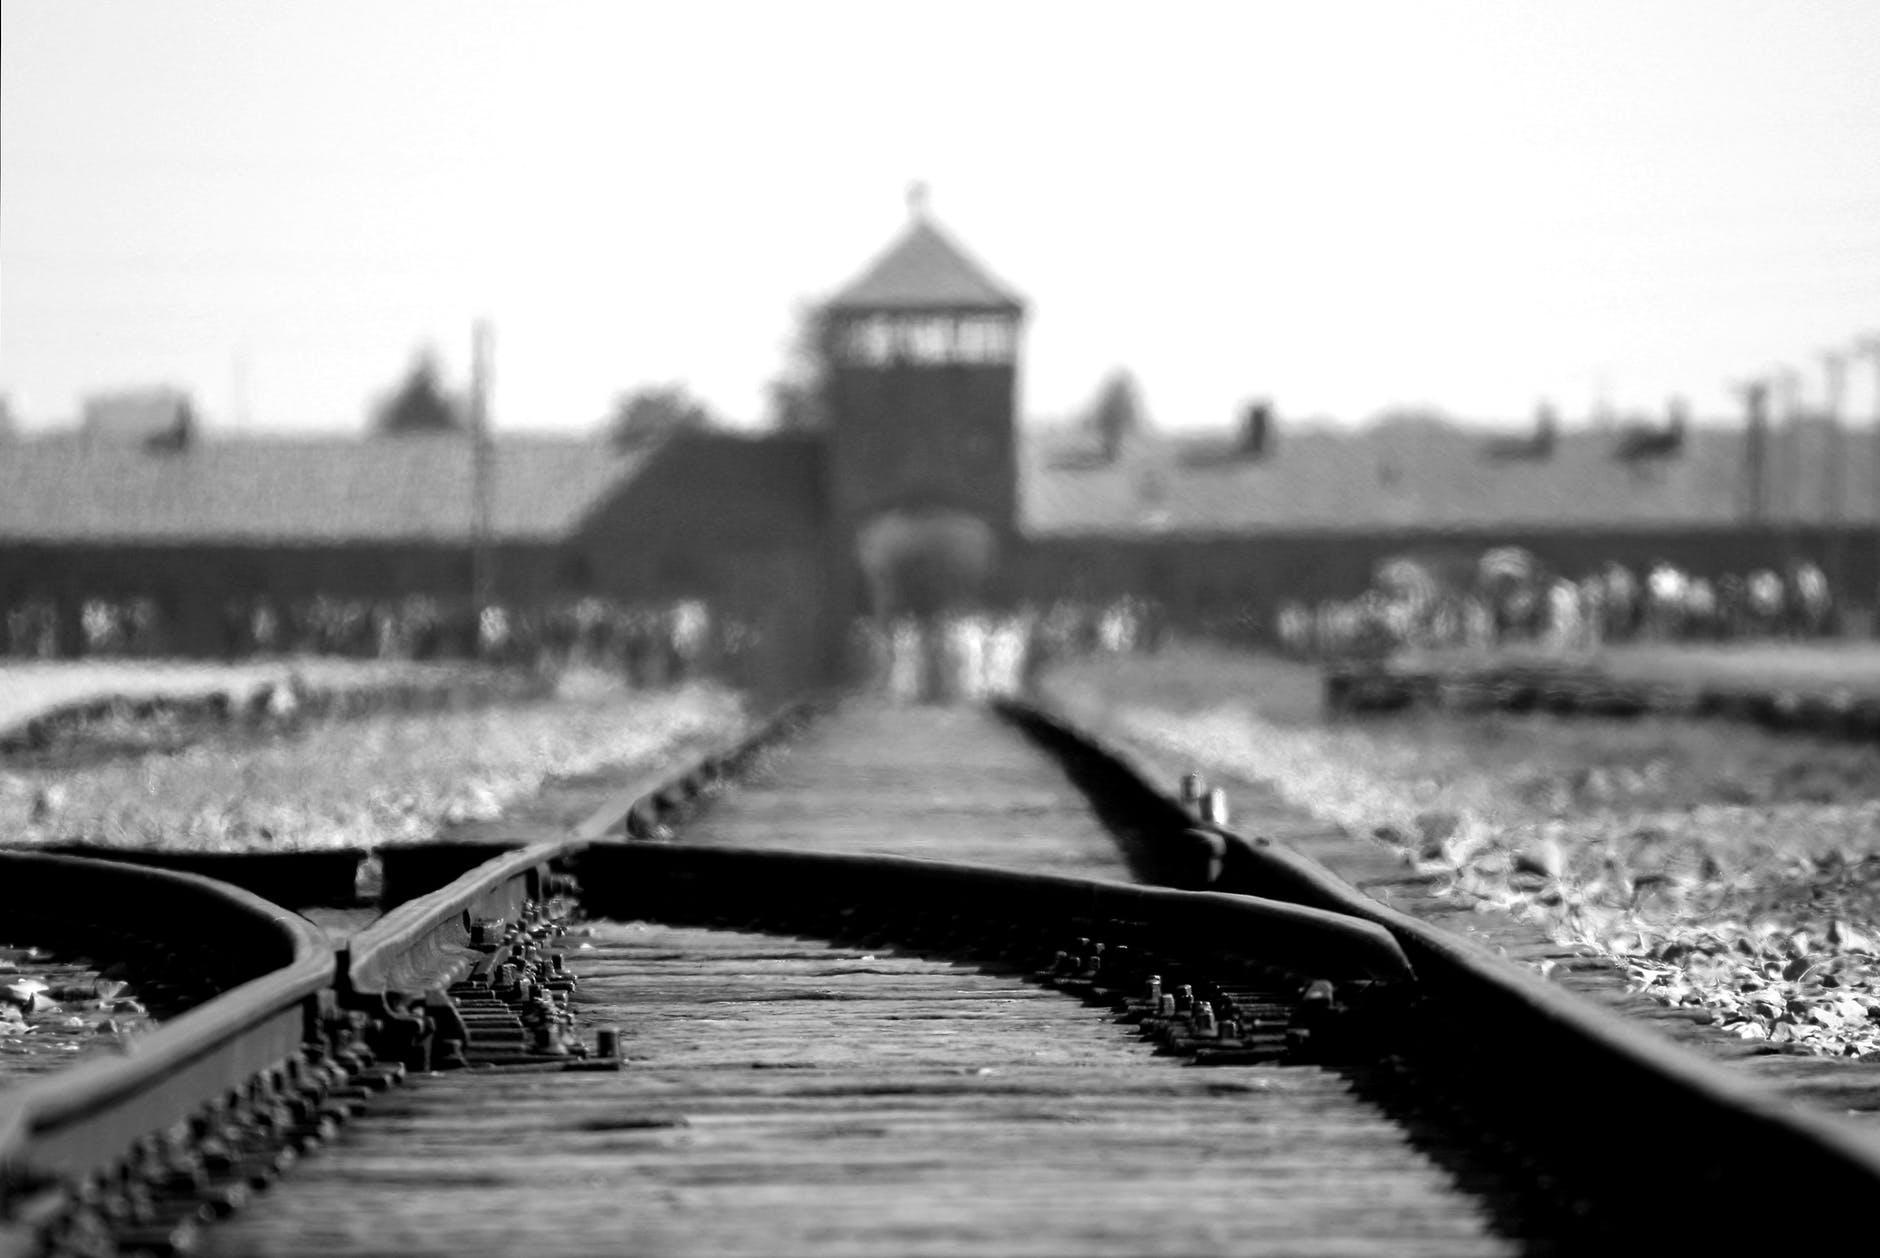 black metal train rails